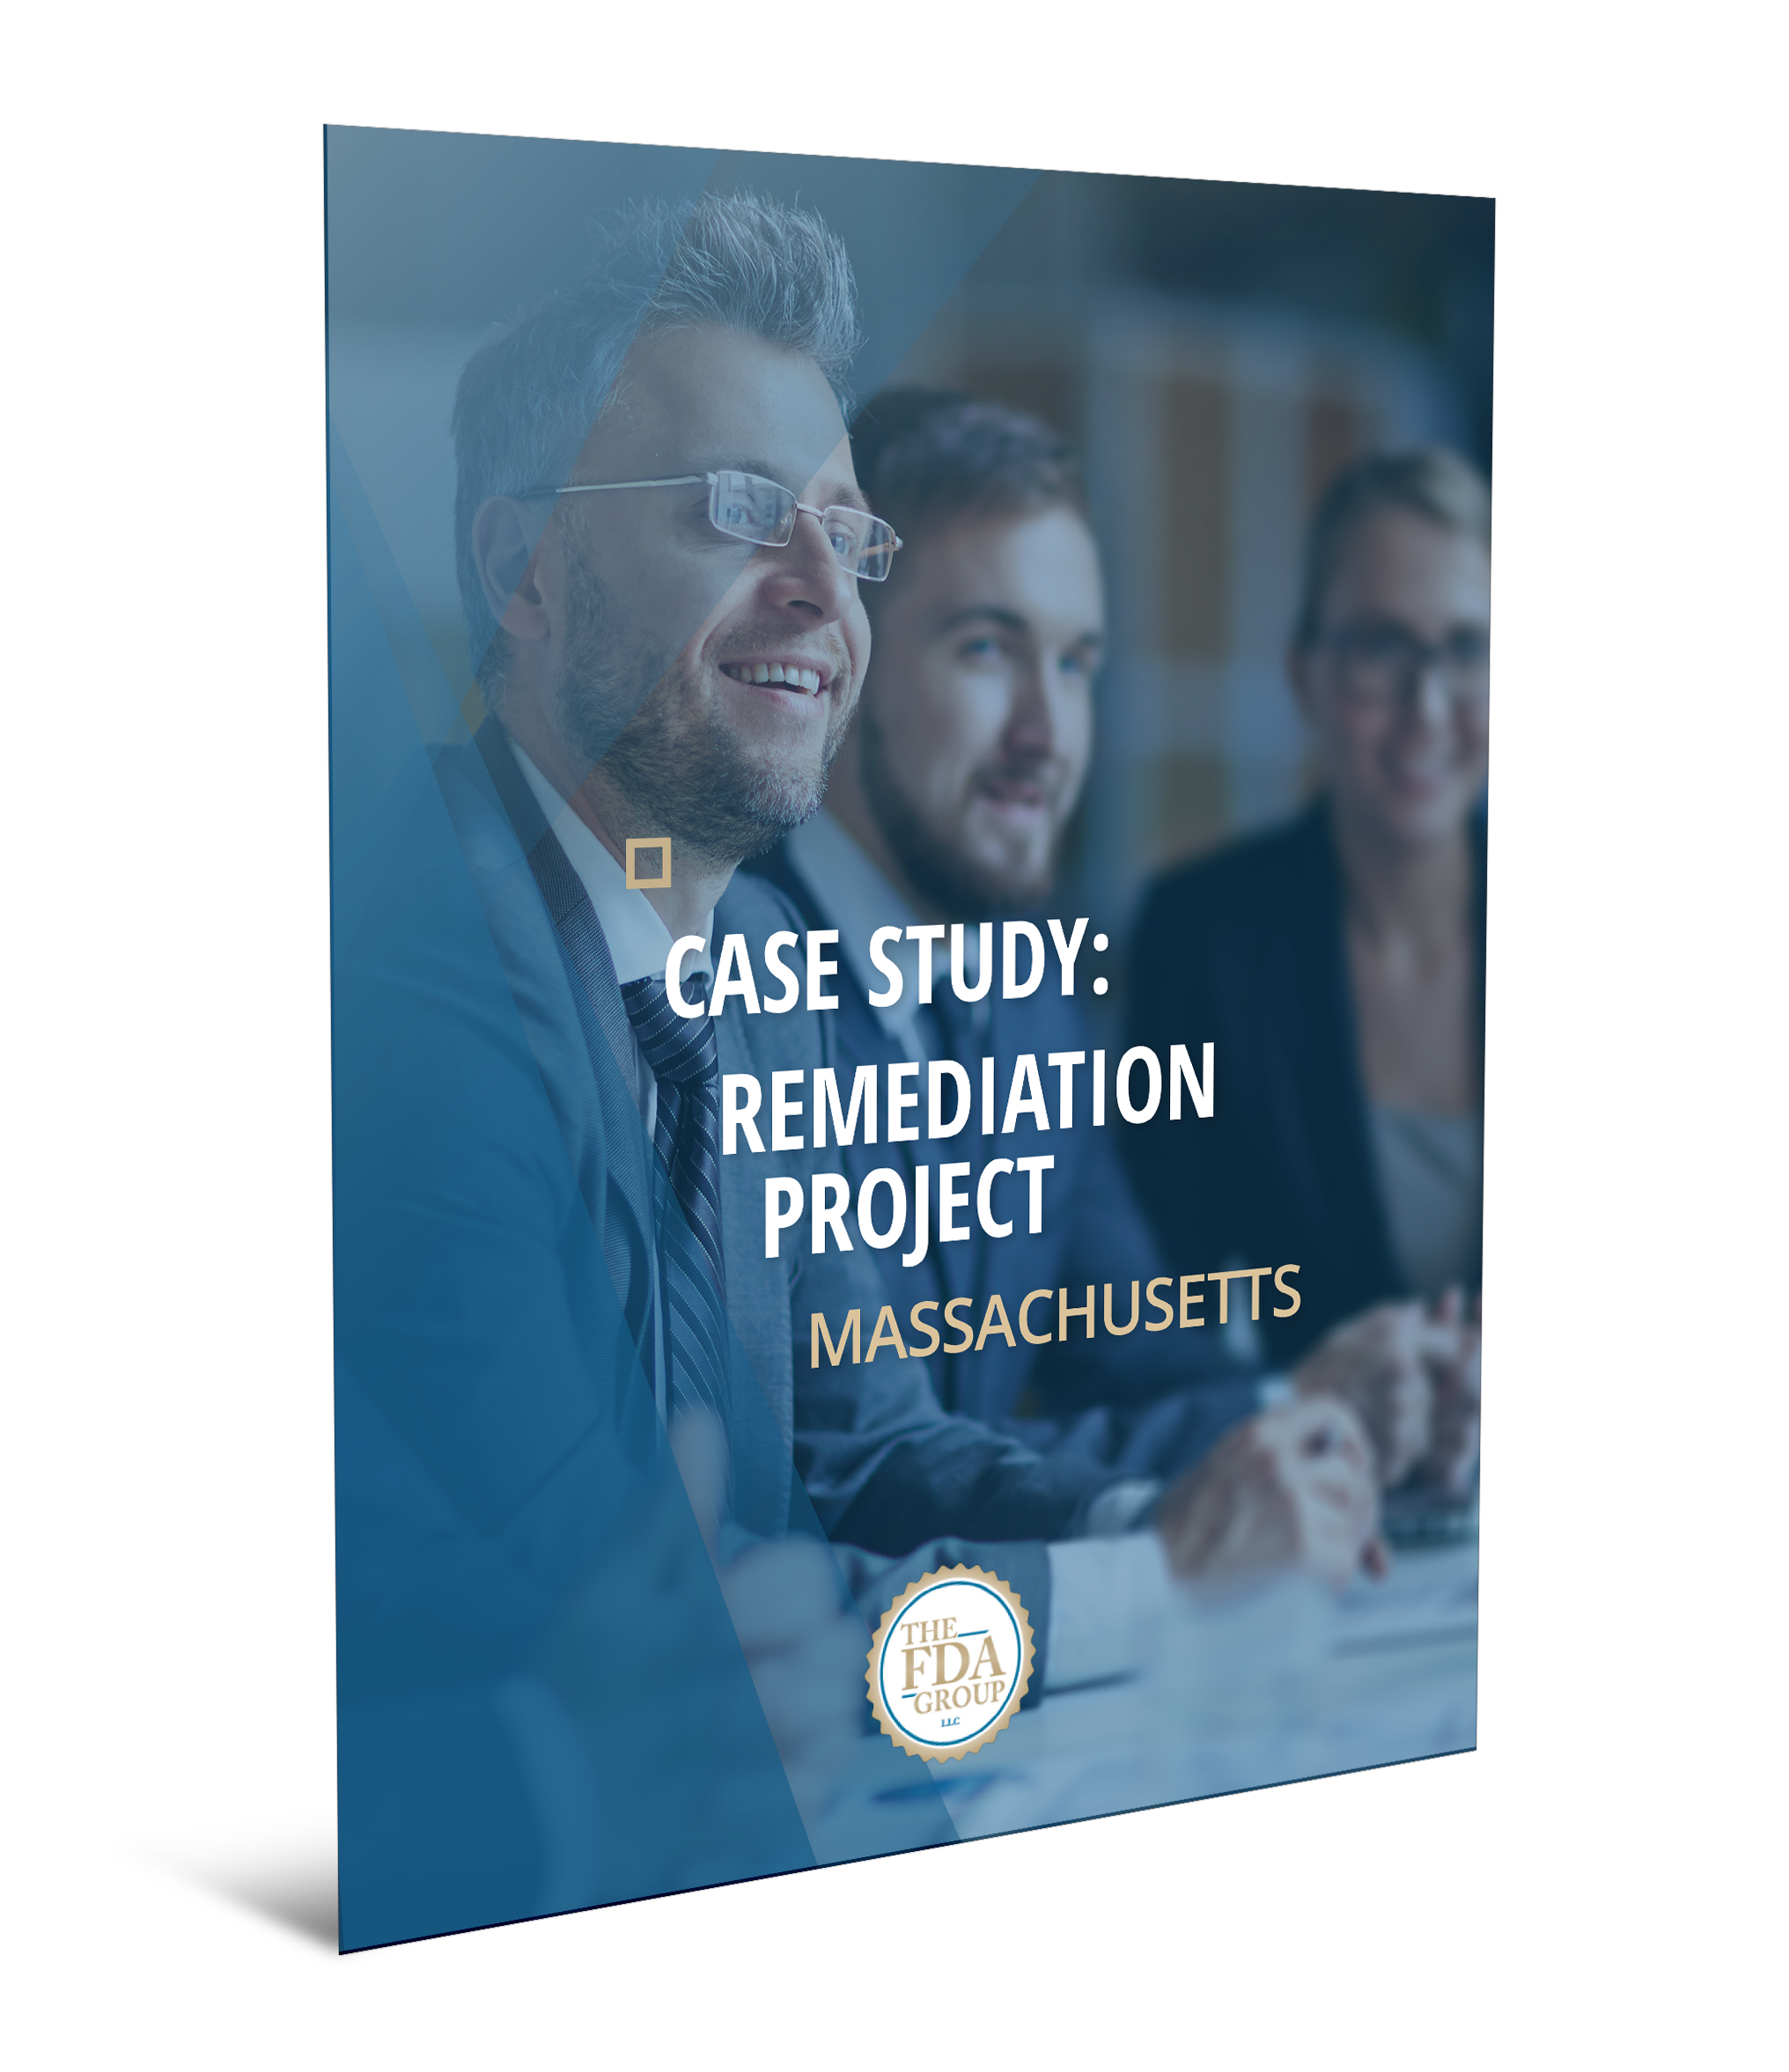 Case Study: Remediation Project – Massachusetts